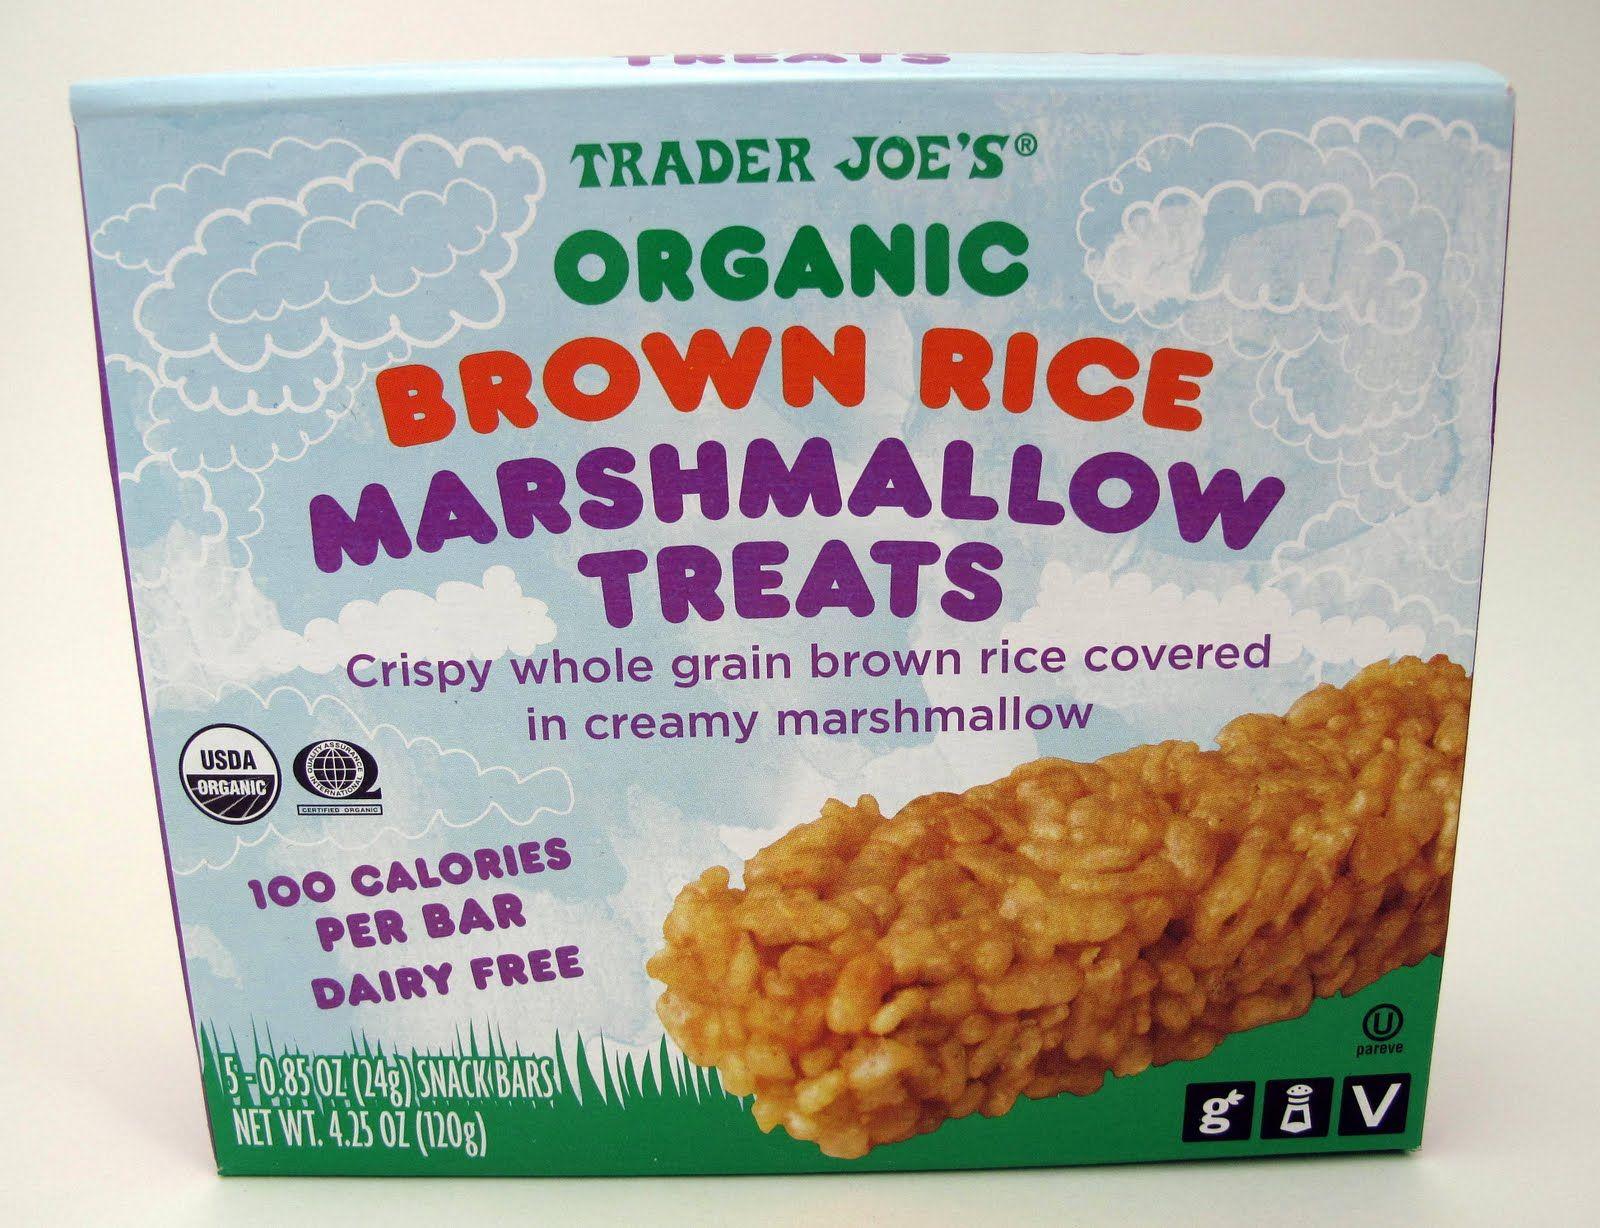 The Laziest Vegans In The World Vegan Friendly Trader Joe S Organic Brown Rice Lazy Vegan Trader Joes